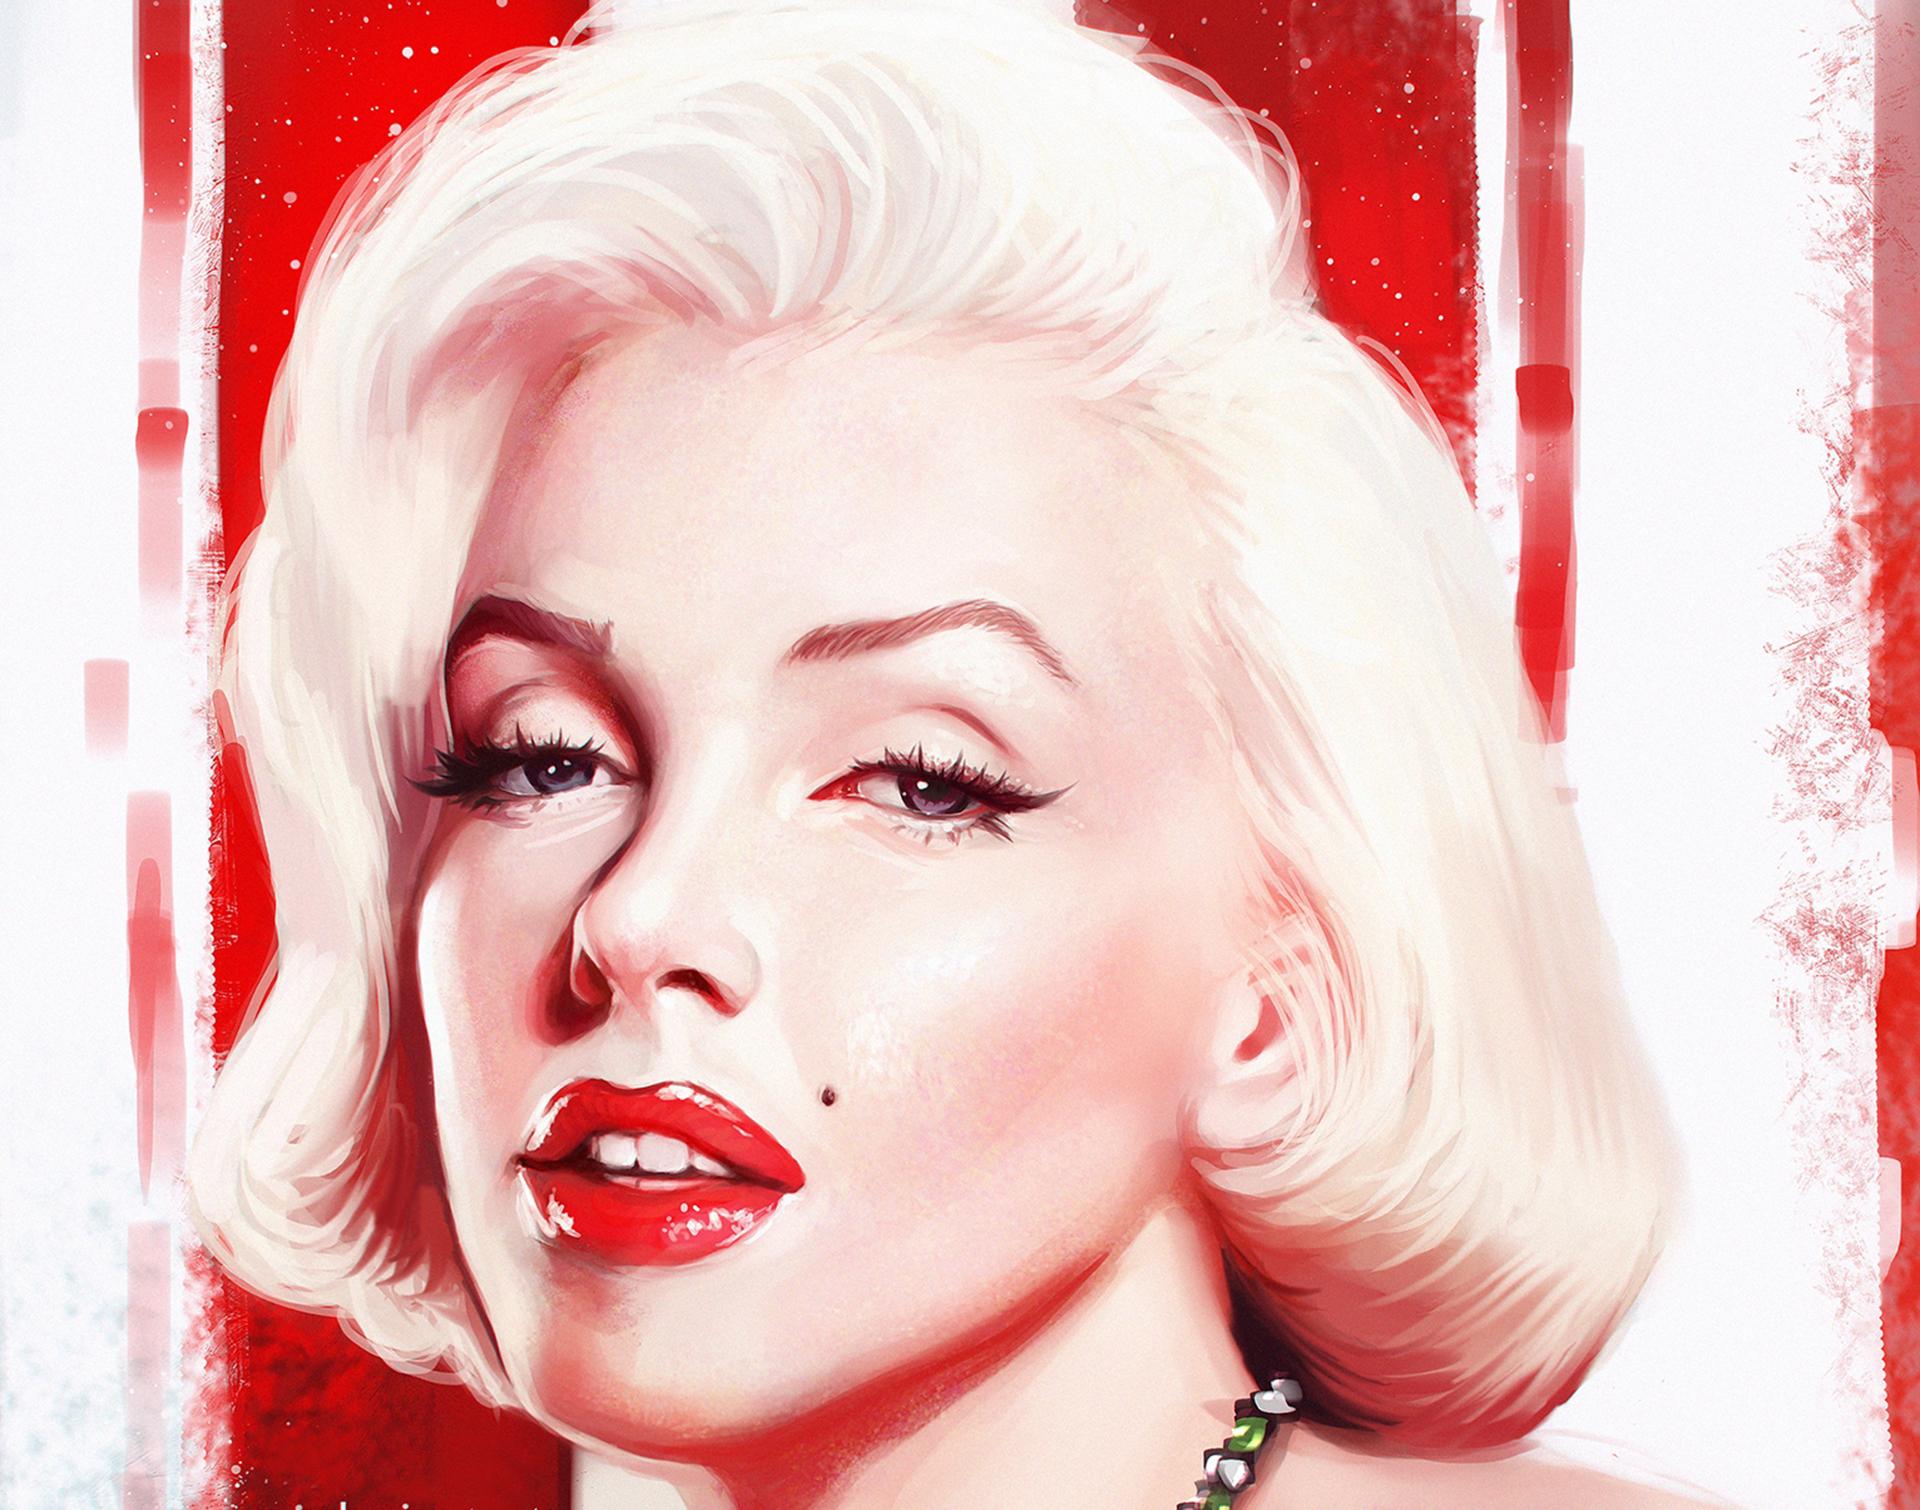 Marilyn monroe hd wallpaper background image 1920x1510 id 841334 wallpaper abyss - Marilyn monroe wallpaper download ...